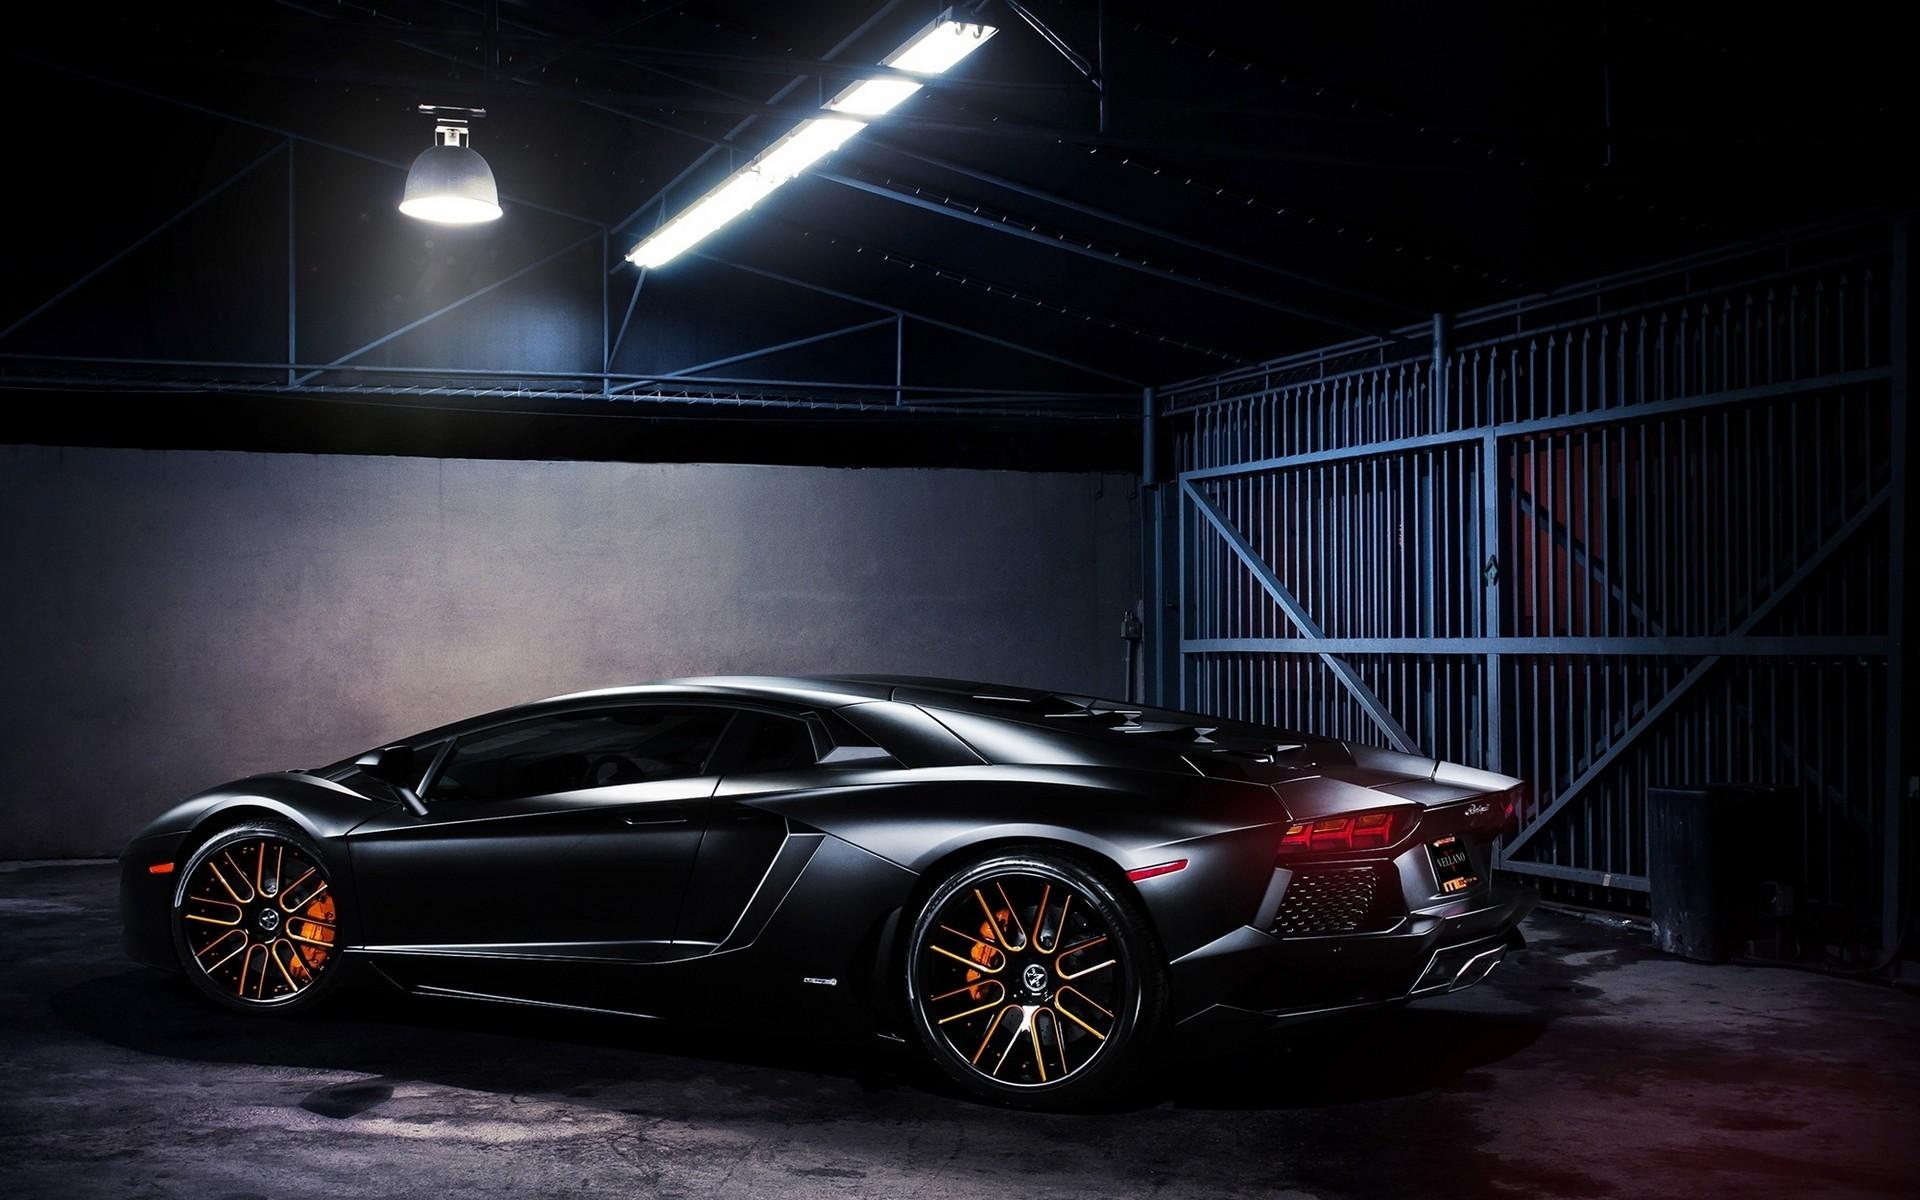 Wallpaper Lamp Lamborghini Aventador Black Cars Super